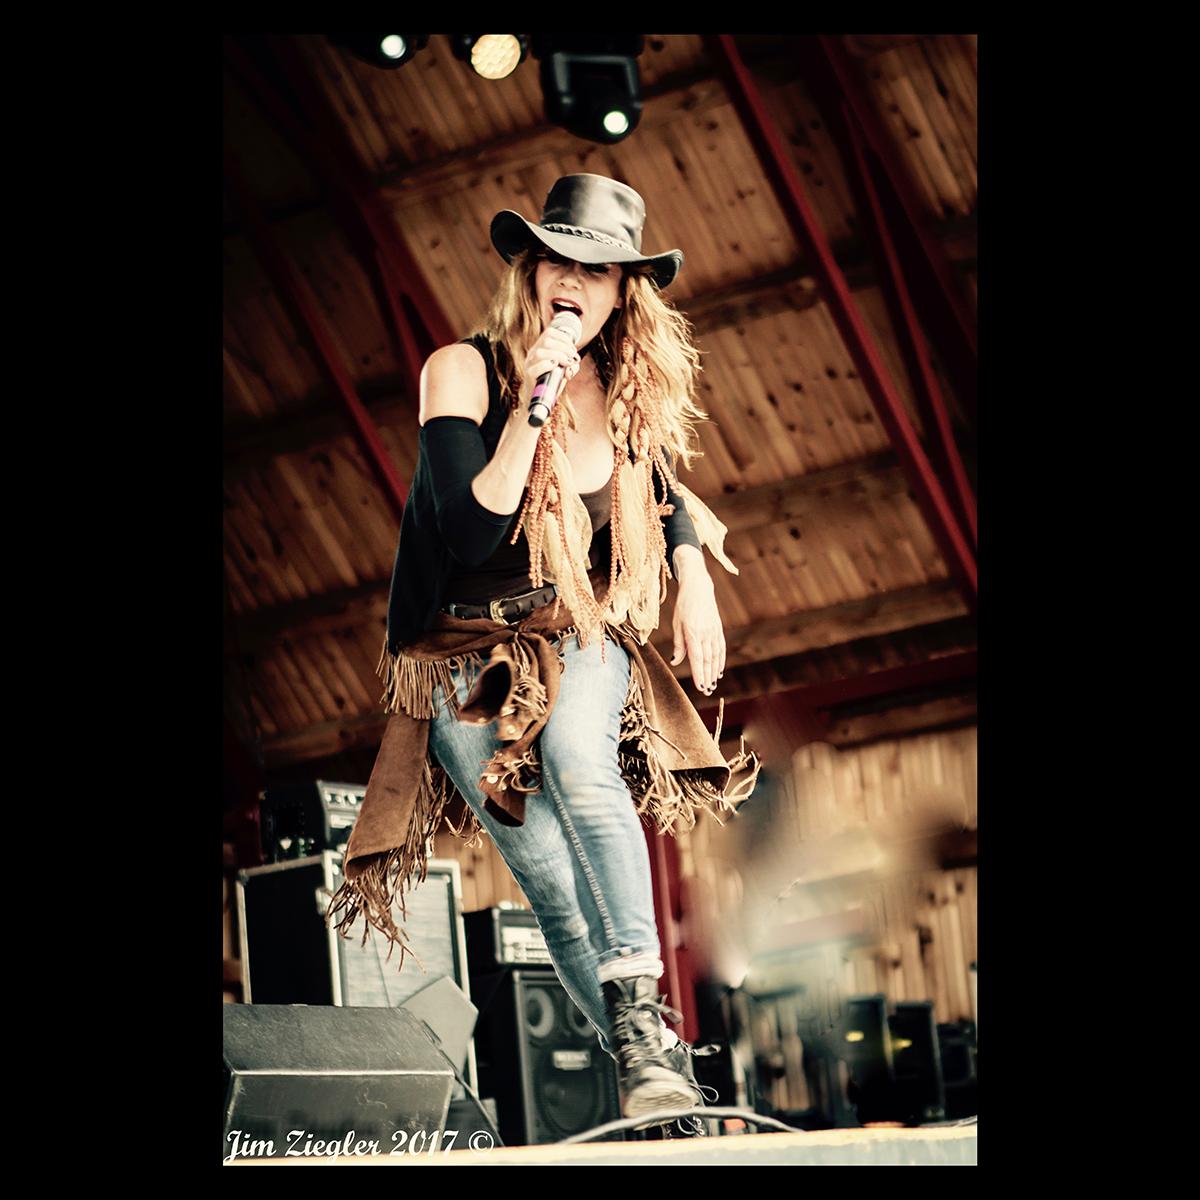 One Ugly Cowboy - Jane Lead Vocalist - Photo by Jim Ziegler